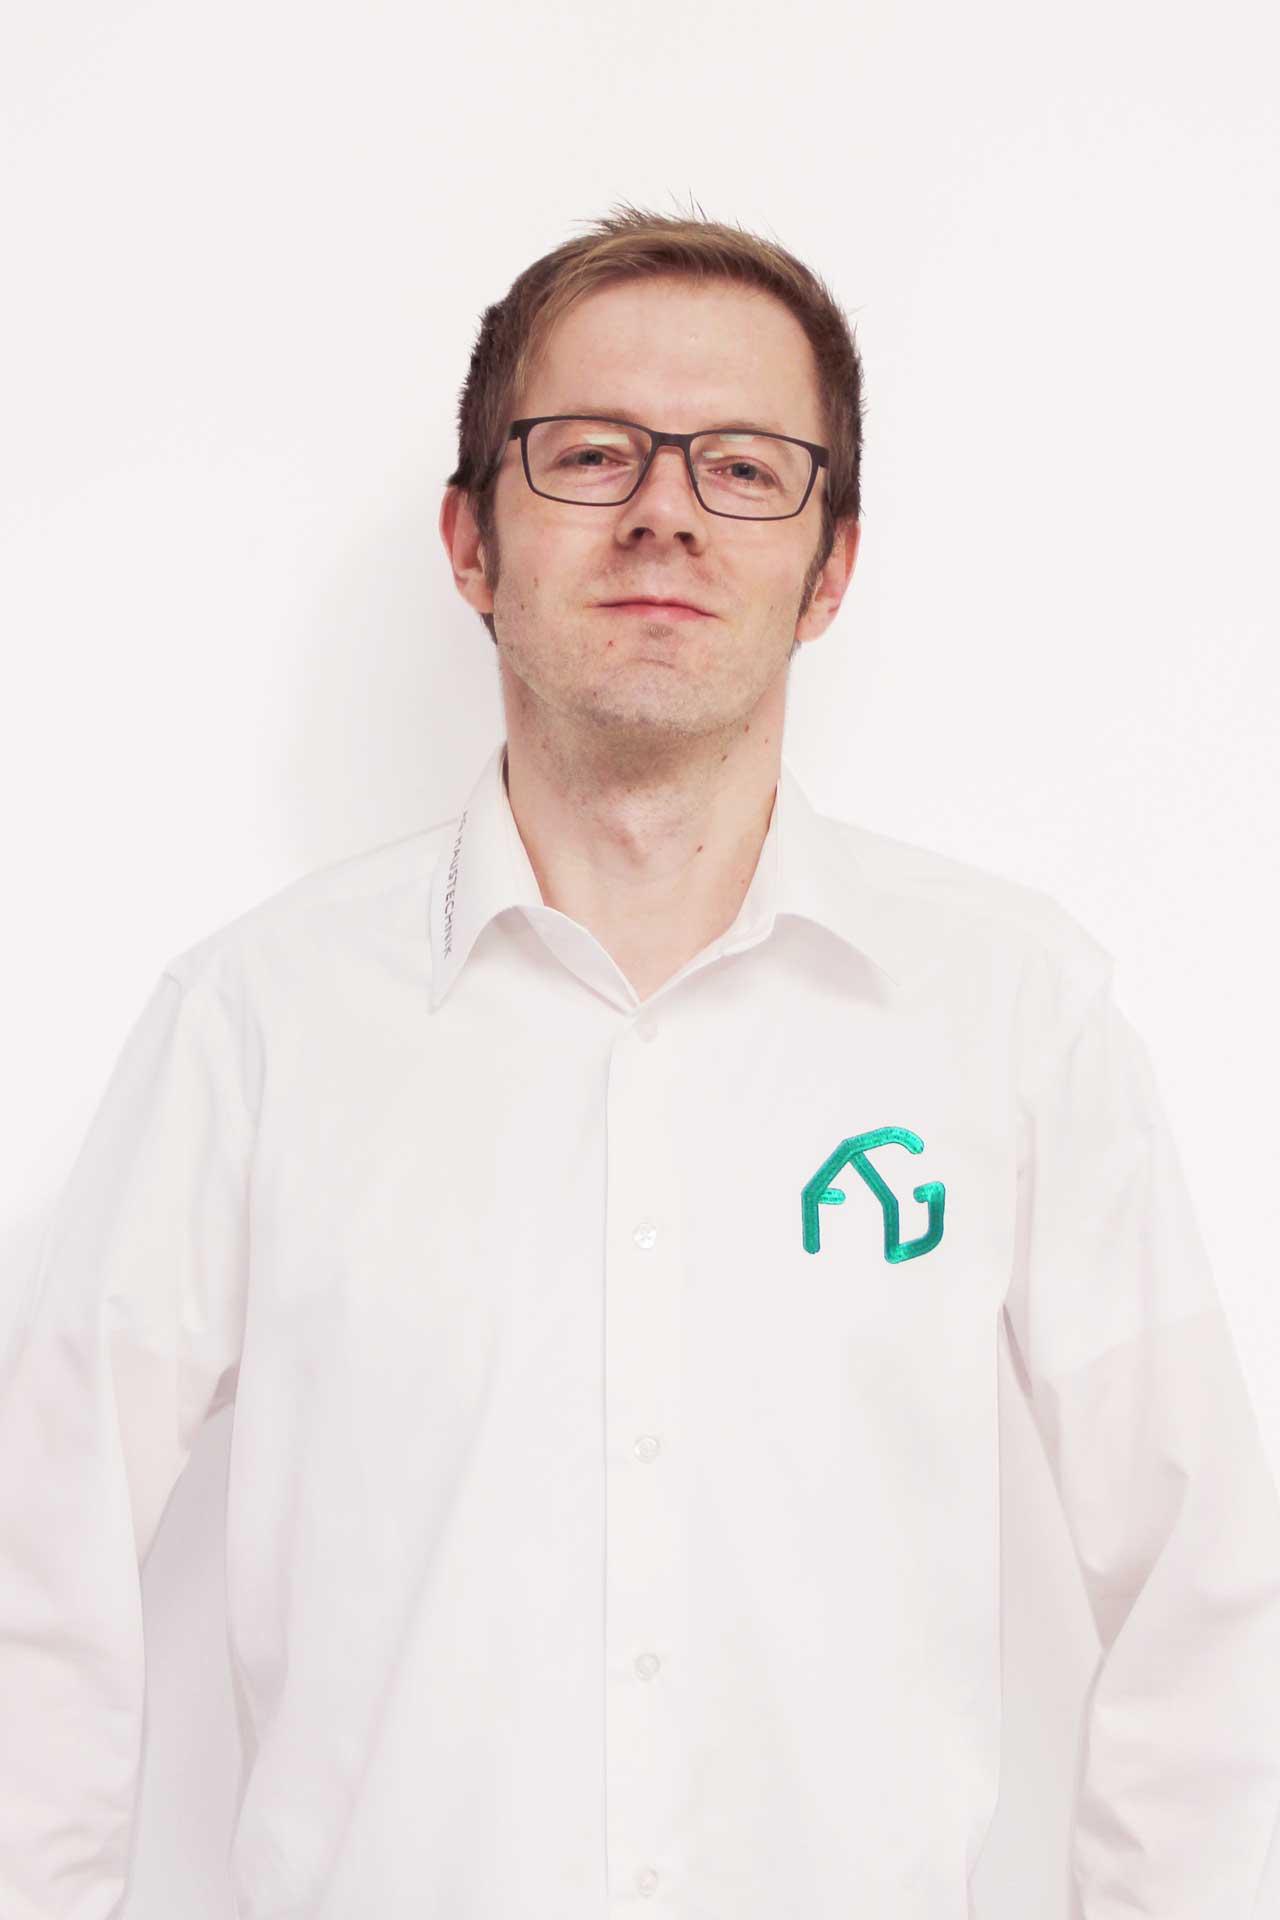 Florian Holzmeister